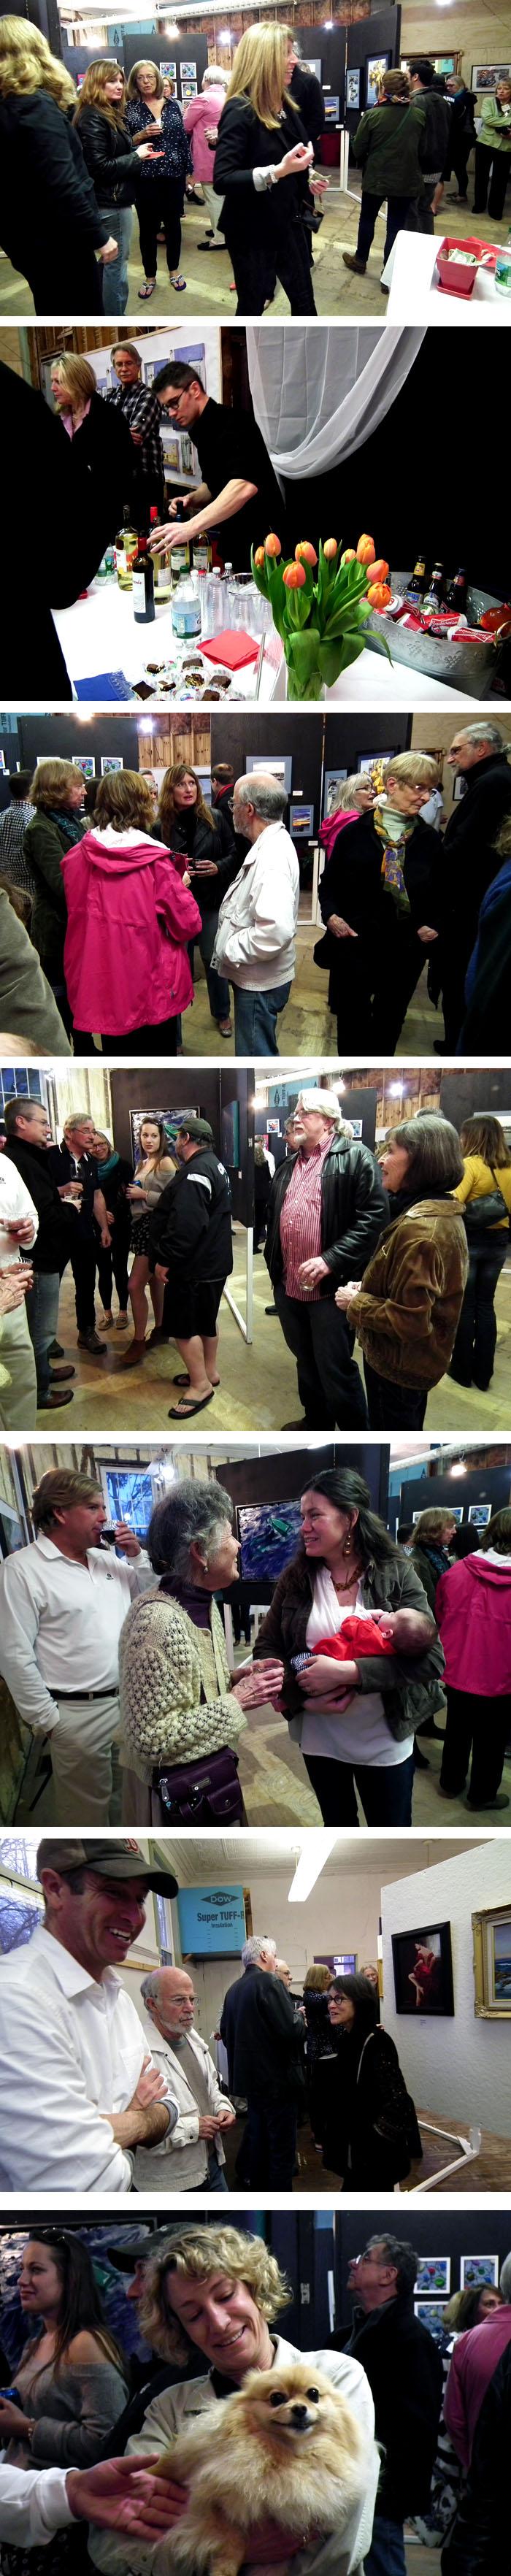 MHS spring art show opening